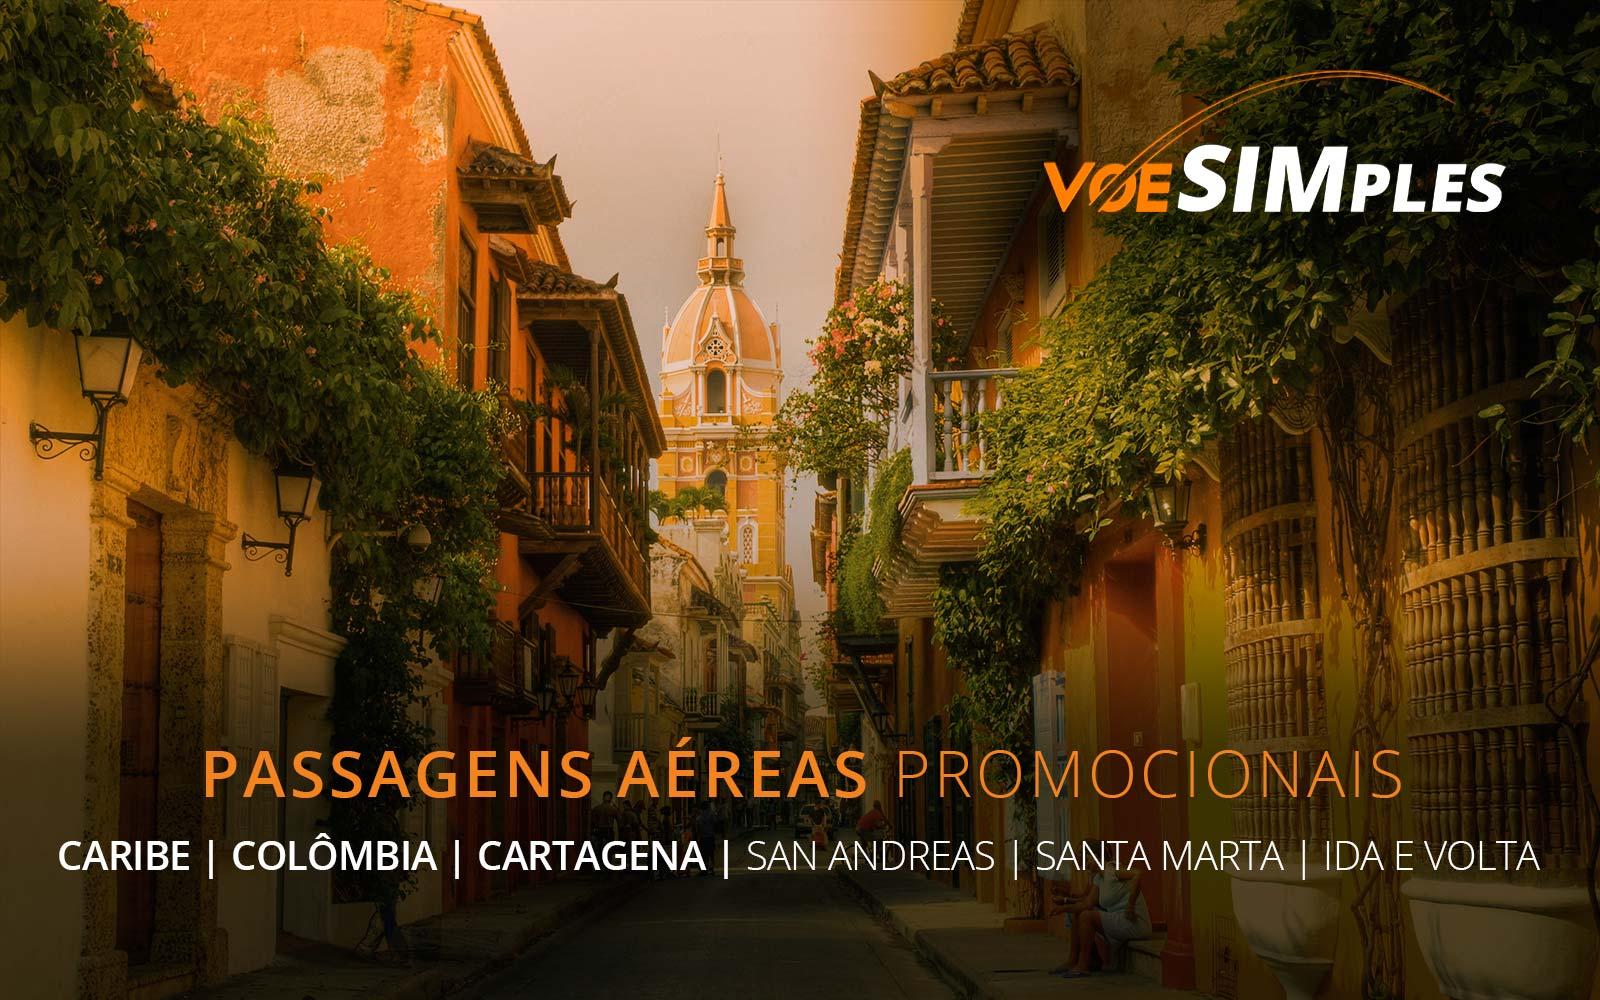 Passagens aéreas promocionais para Cartagena, San Andrés e Santa Marta no Caribe Colombiano